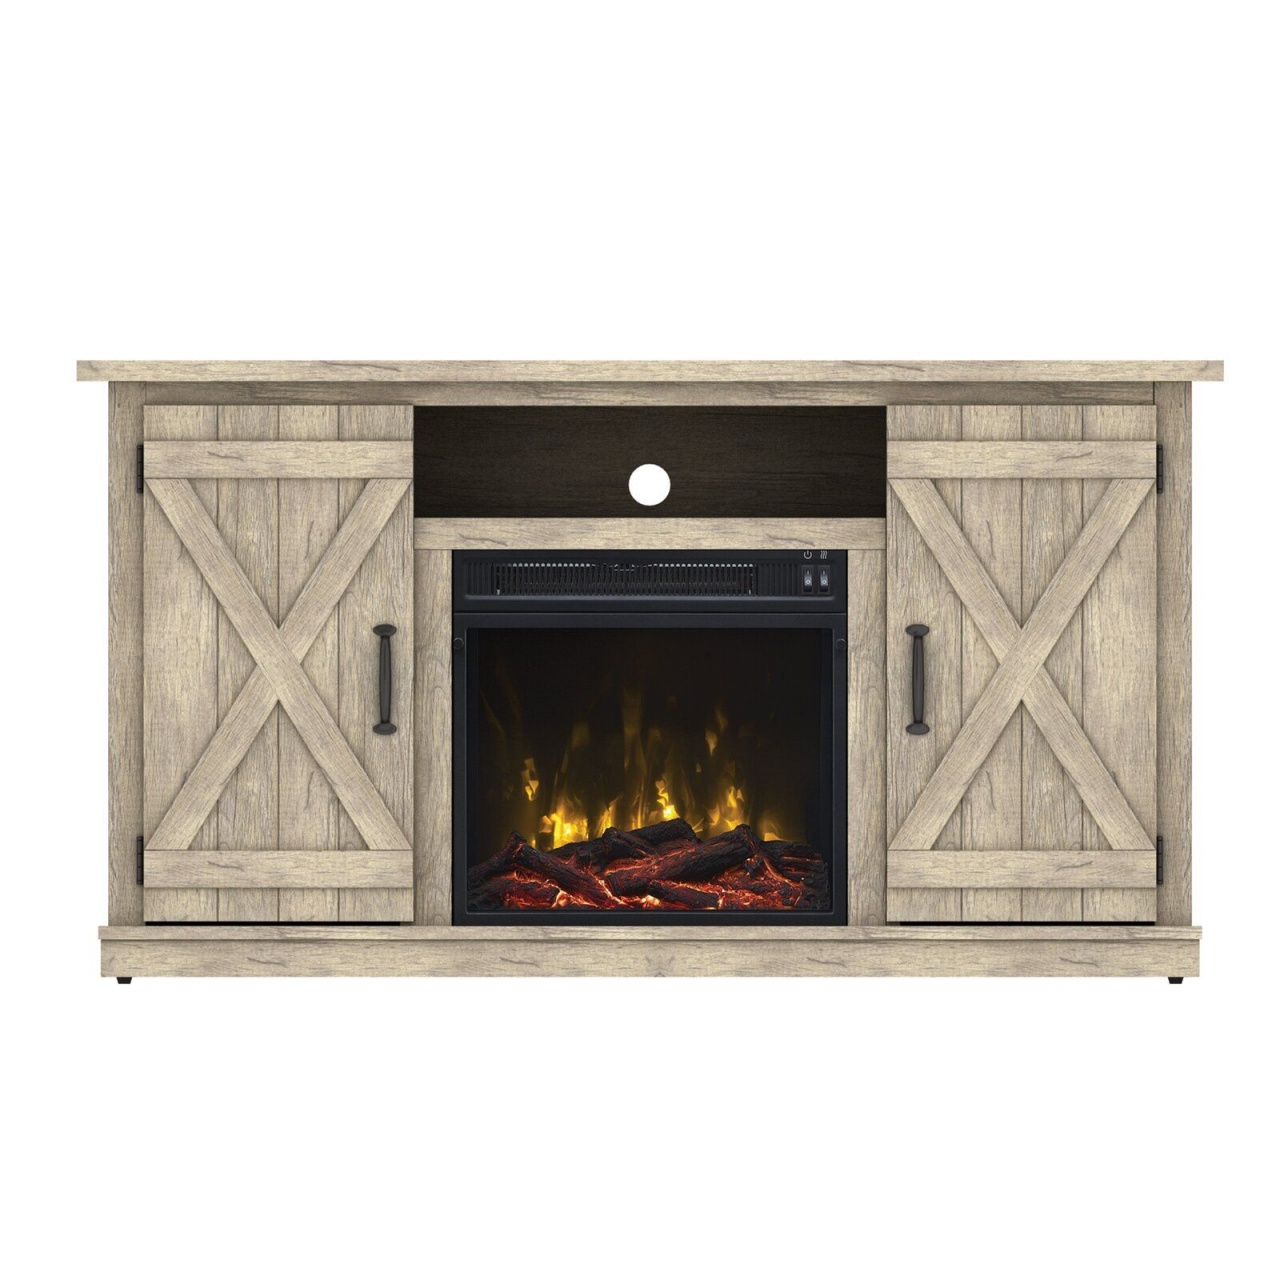 boston loft furnishings electric fireplace chateau gel fuel fireplace guest room from boston loft furnishings electric fireplace